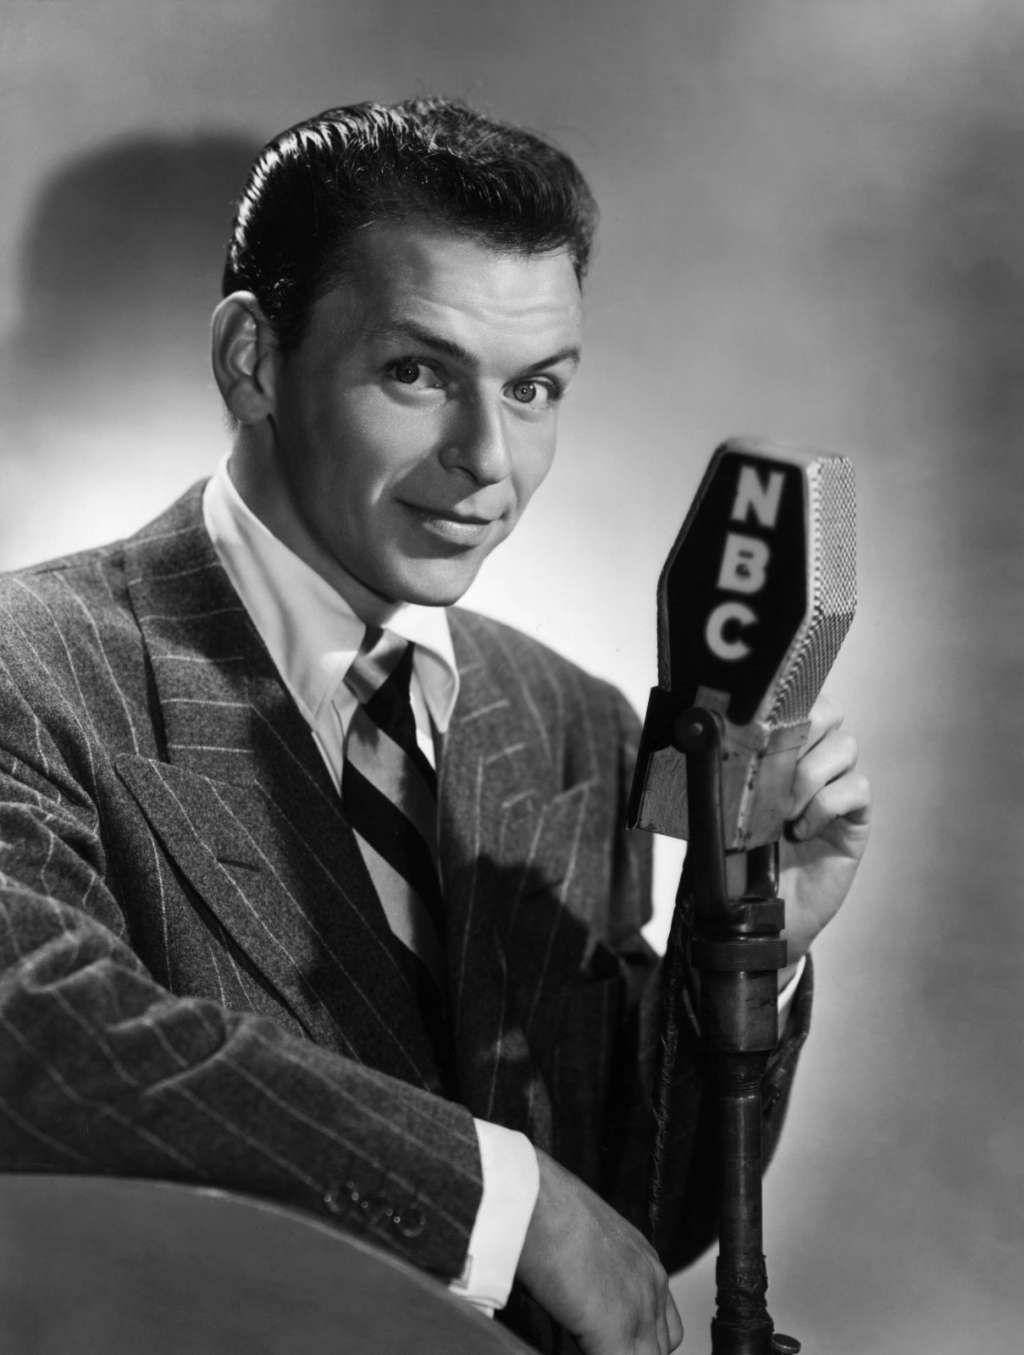 Frank Sinartra Smiling Pose American Singer Actor Poster Black White Photo Hat